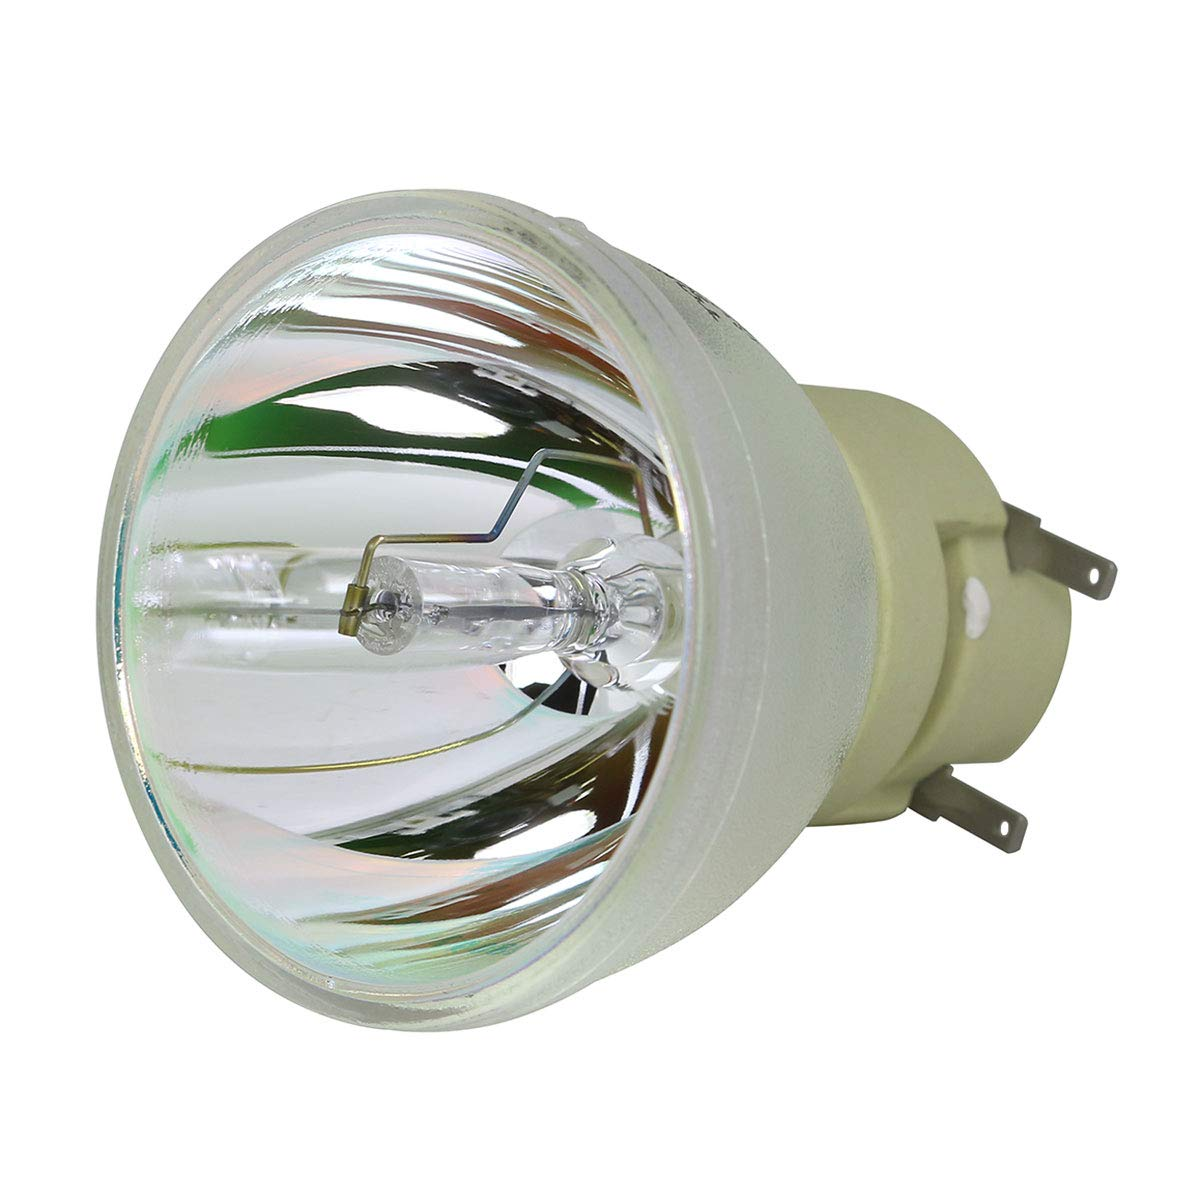 SpArc プロジェクター交換用ランプ 囲い/電球付き Optoma HD20用 Platinum (Brighter/Durable) B07MPSSFHD Lamp Only Platinum (Brighter/Durable)